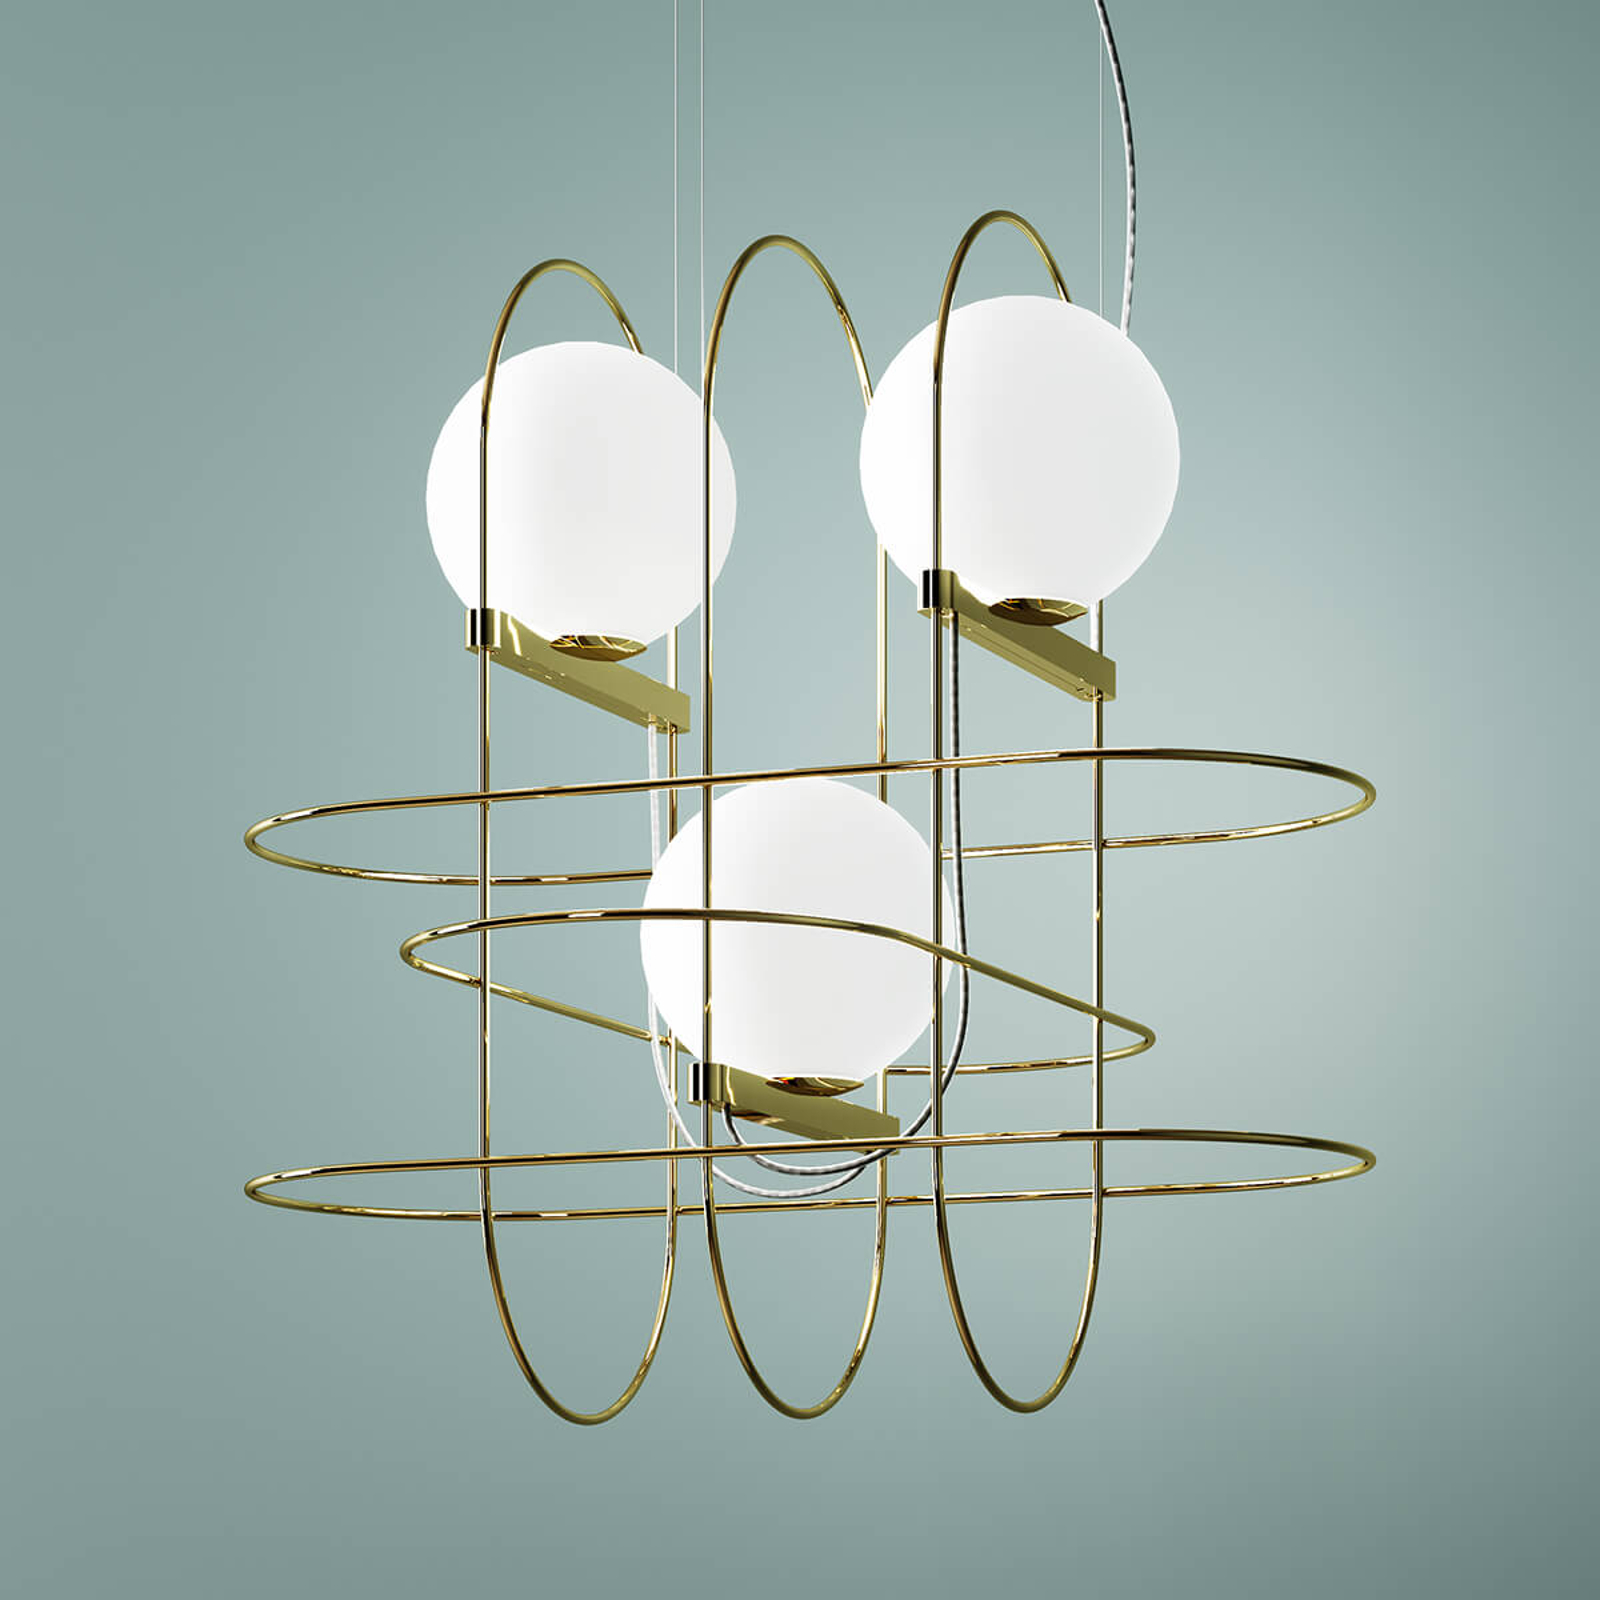 Designerska lampa wisząca LED Setareh, złota